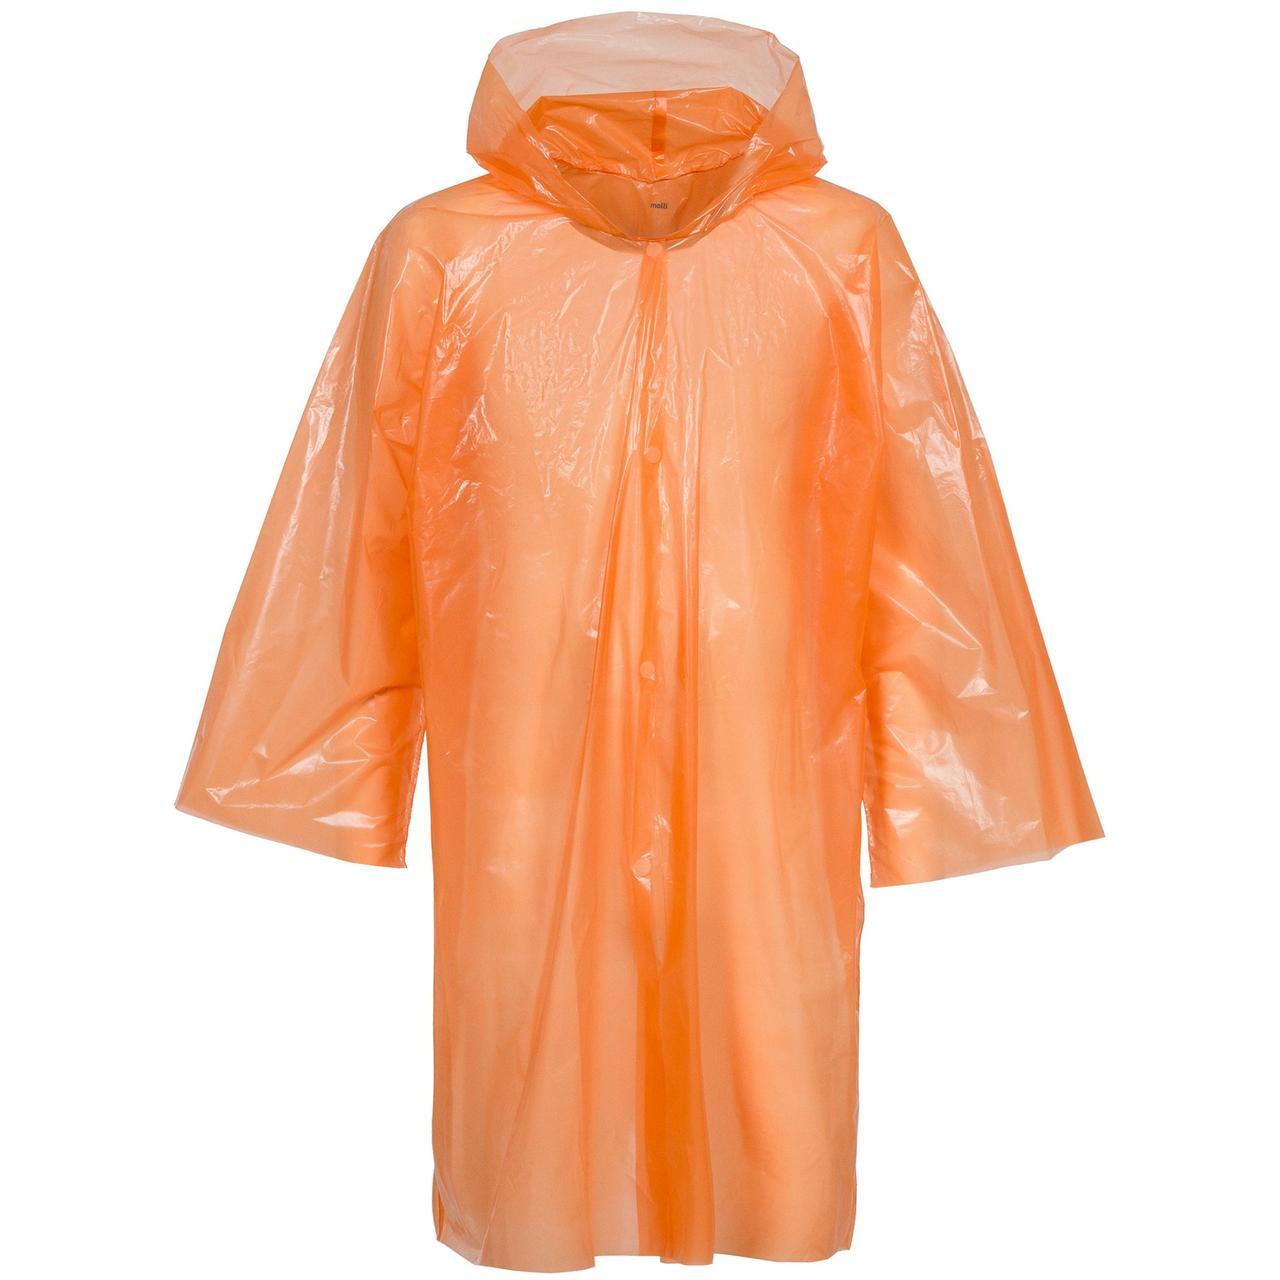 Дождевик-плащ BrightWay, оранжевый (артикул 11875.20)